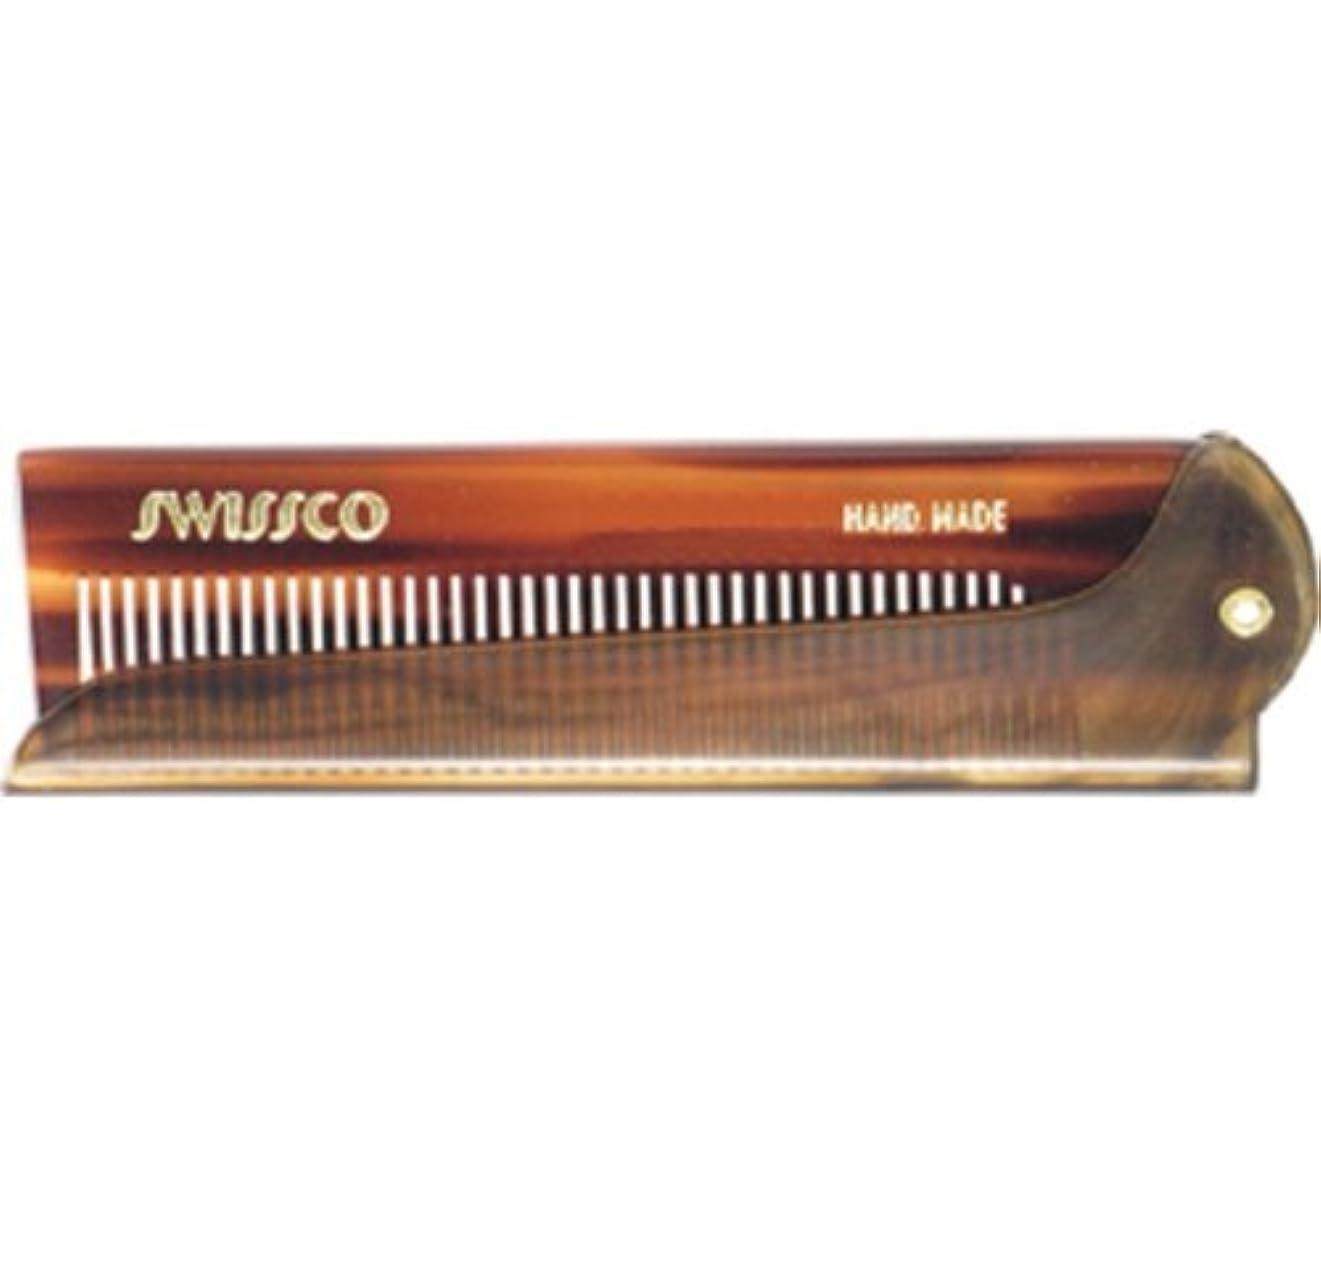 Swissco Tortoise Folding Comb [並行輸入品]